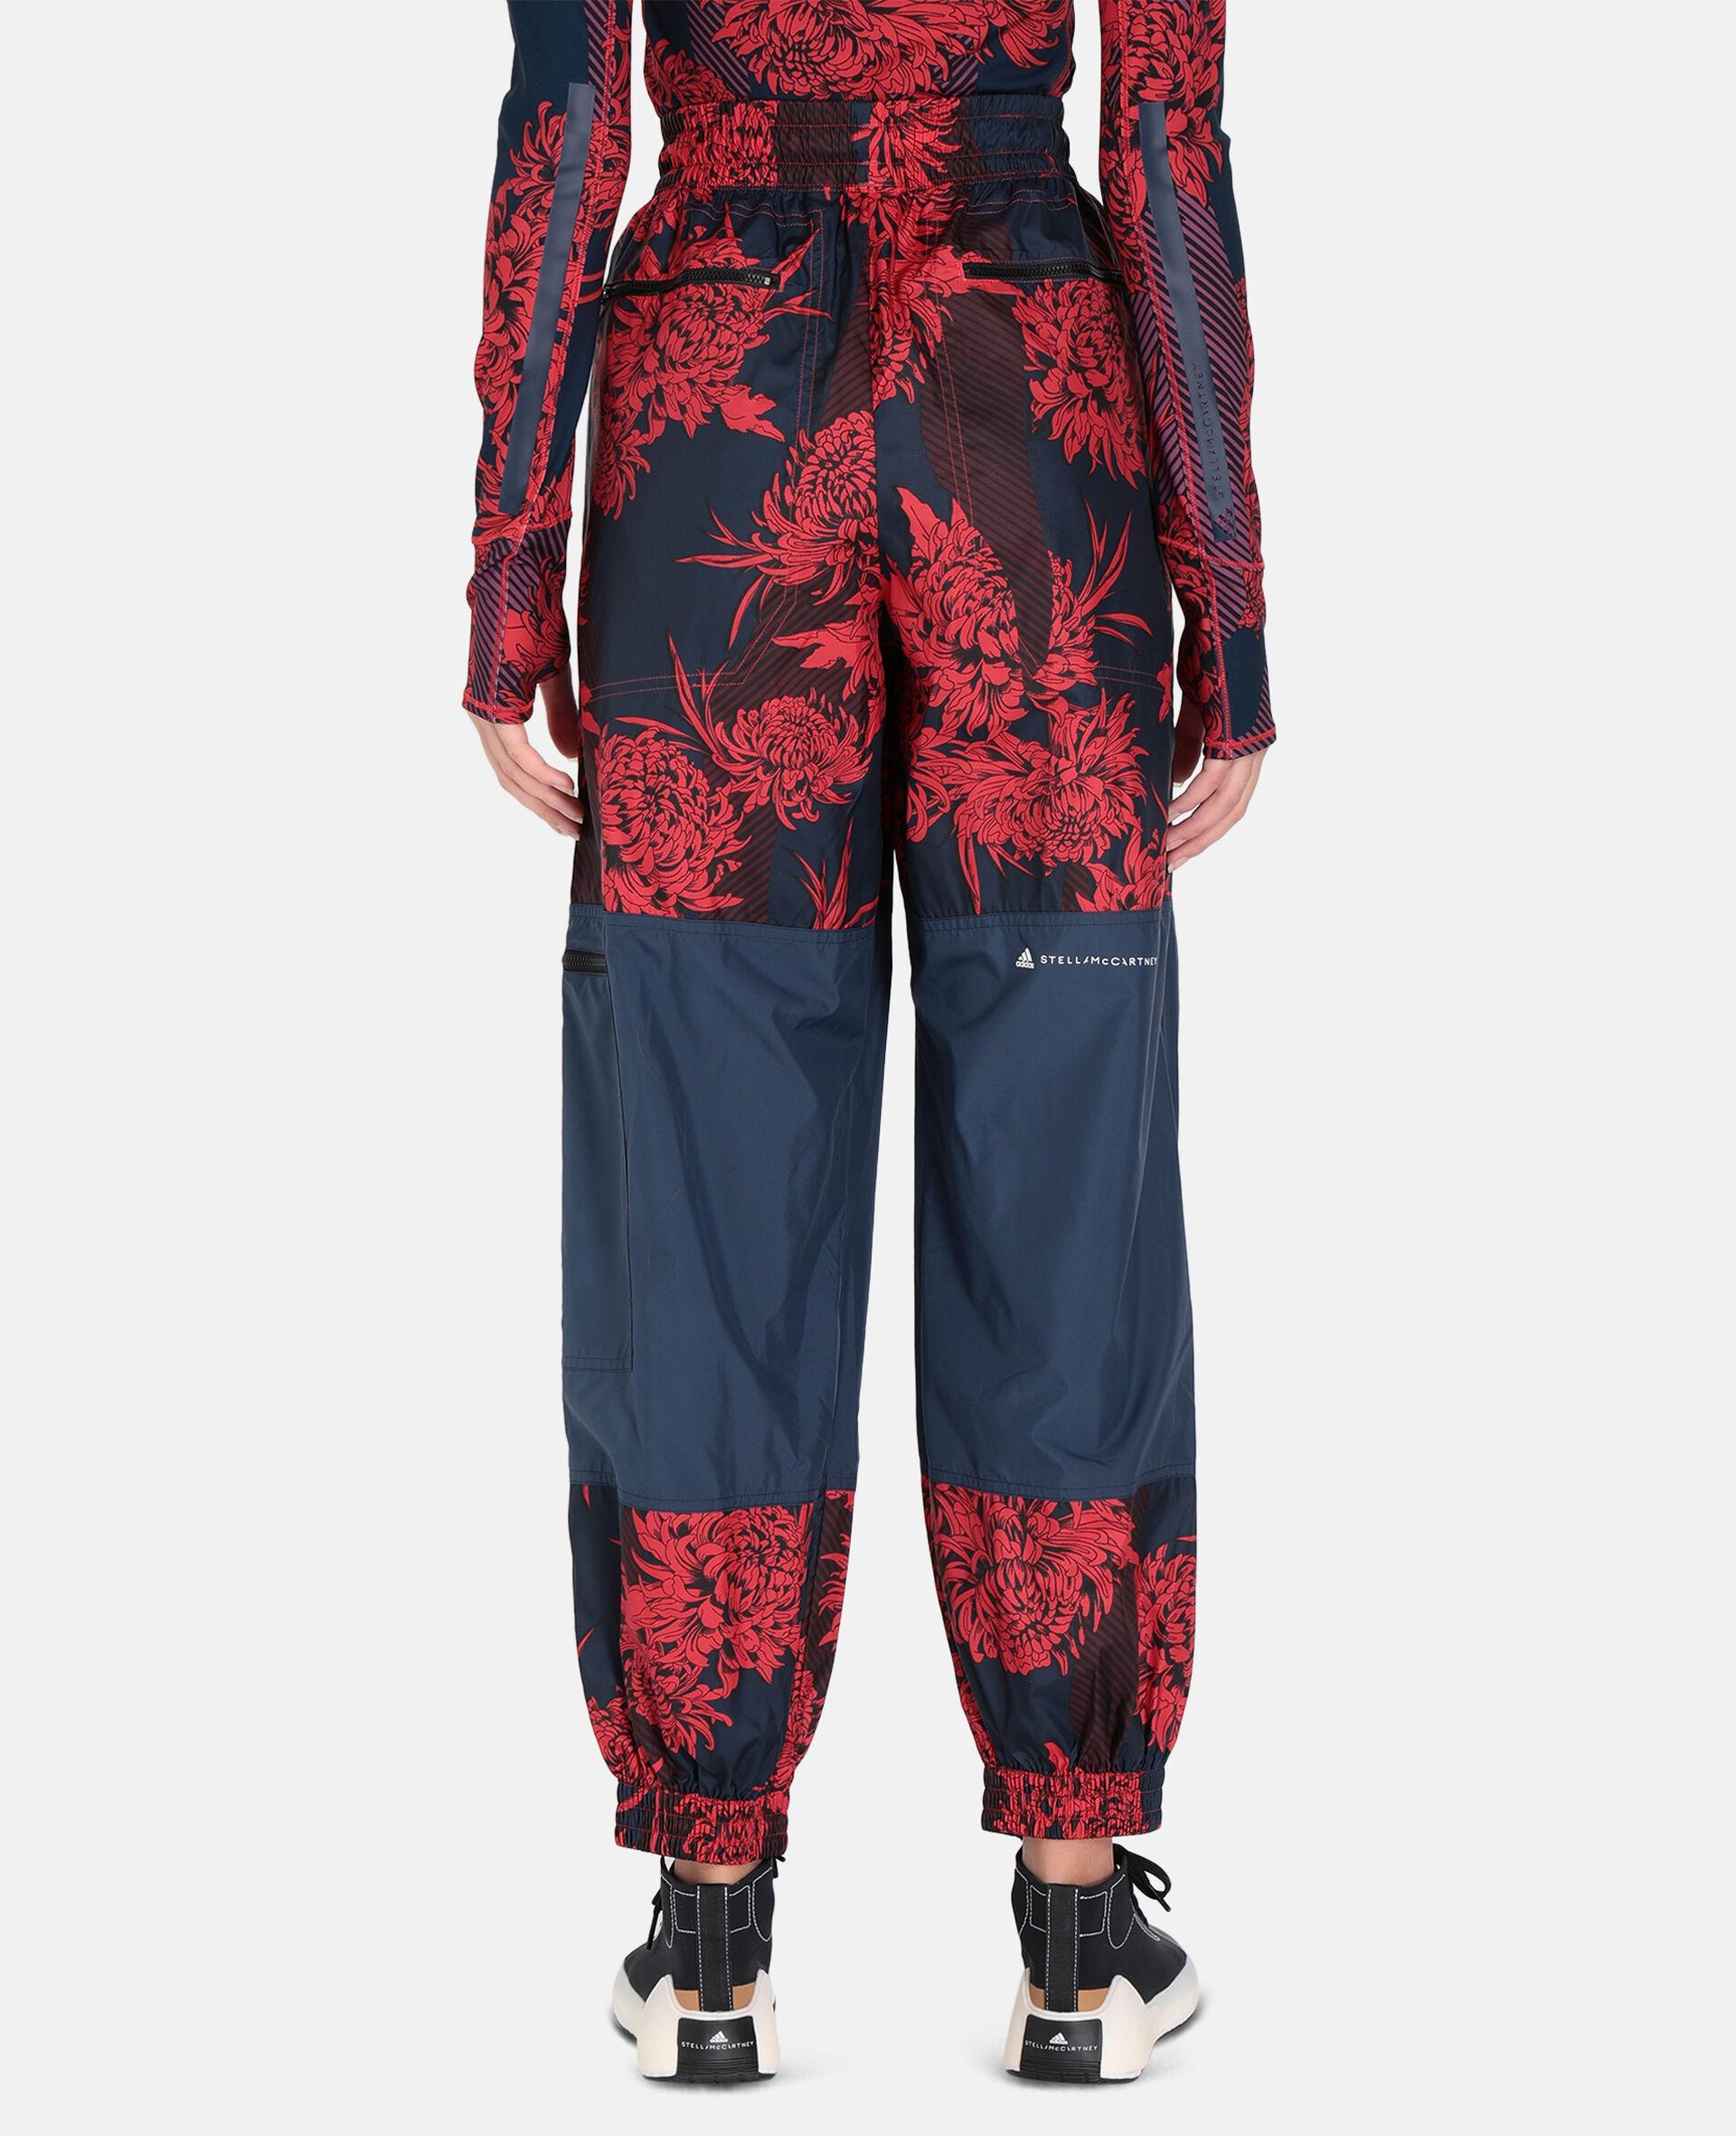 Future Playground 机织 Training 裤装-红色-large image number 2